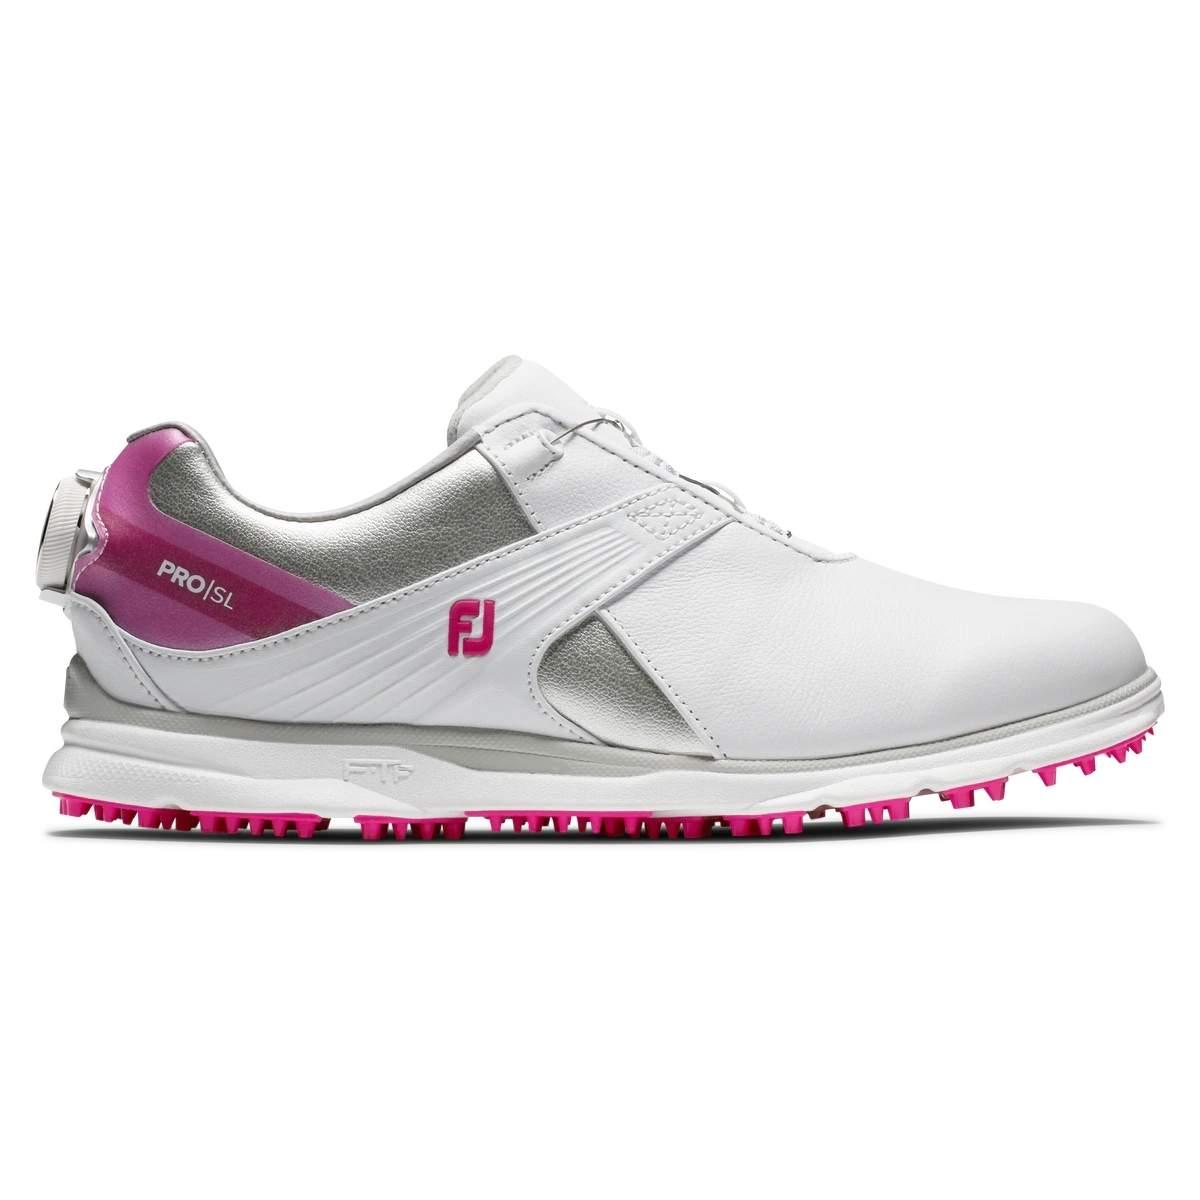 FootJoy Women's Pro|SL BOA White/Pink Golf Shoe - Style 98119